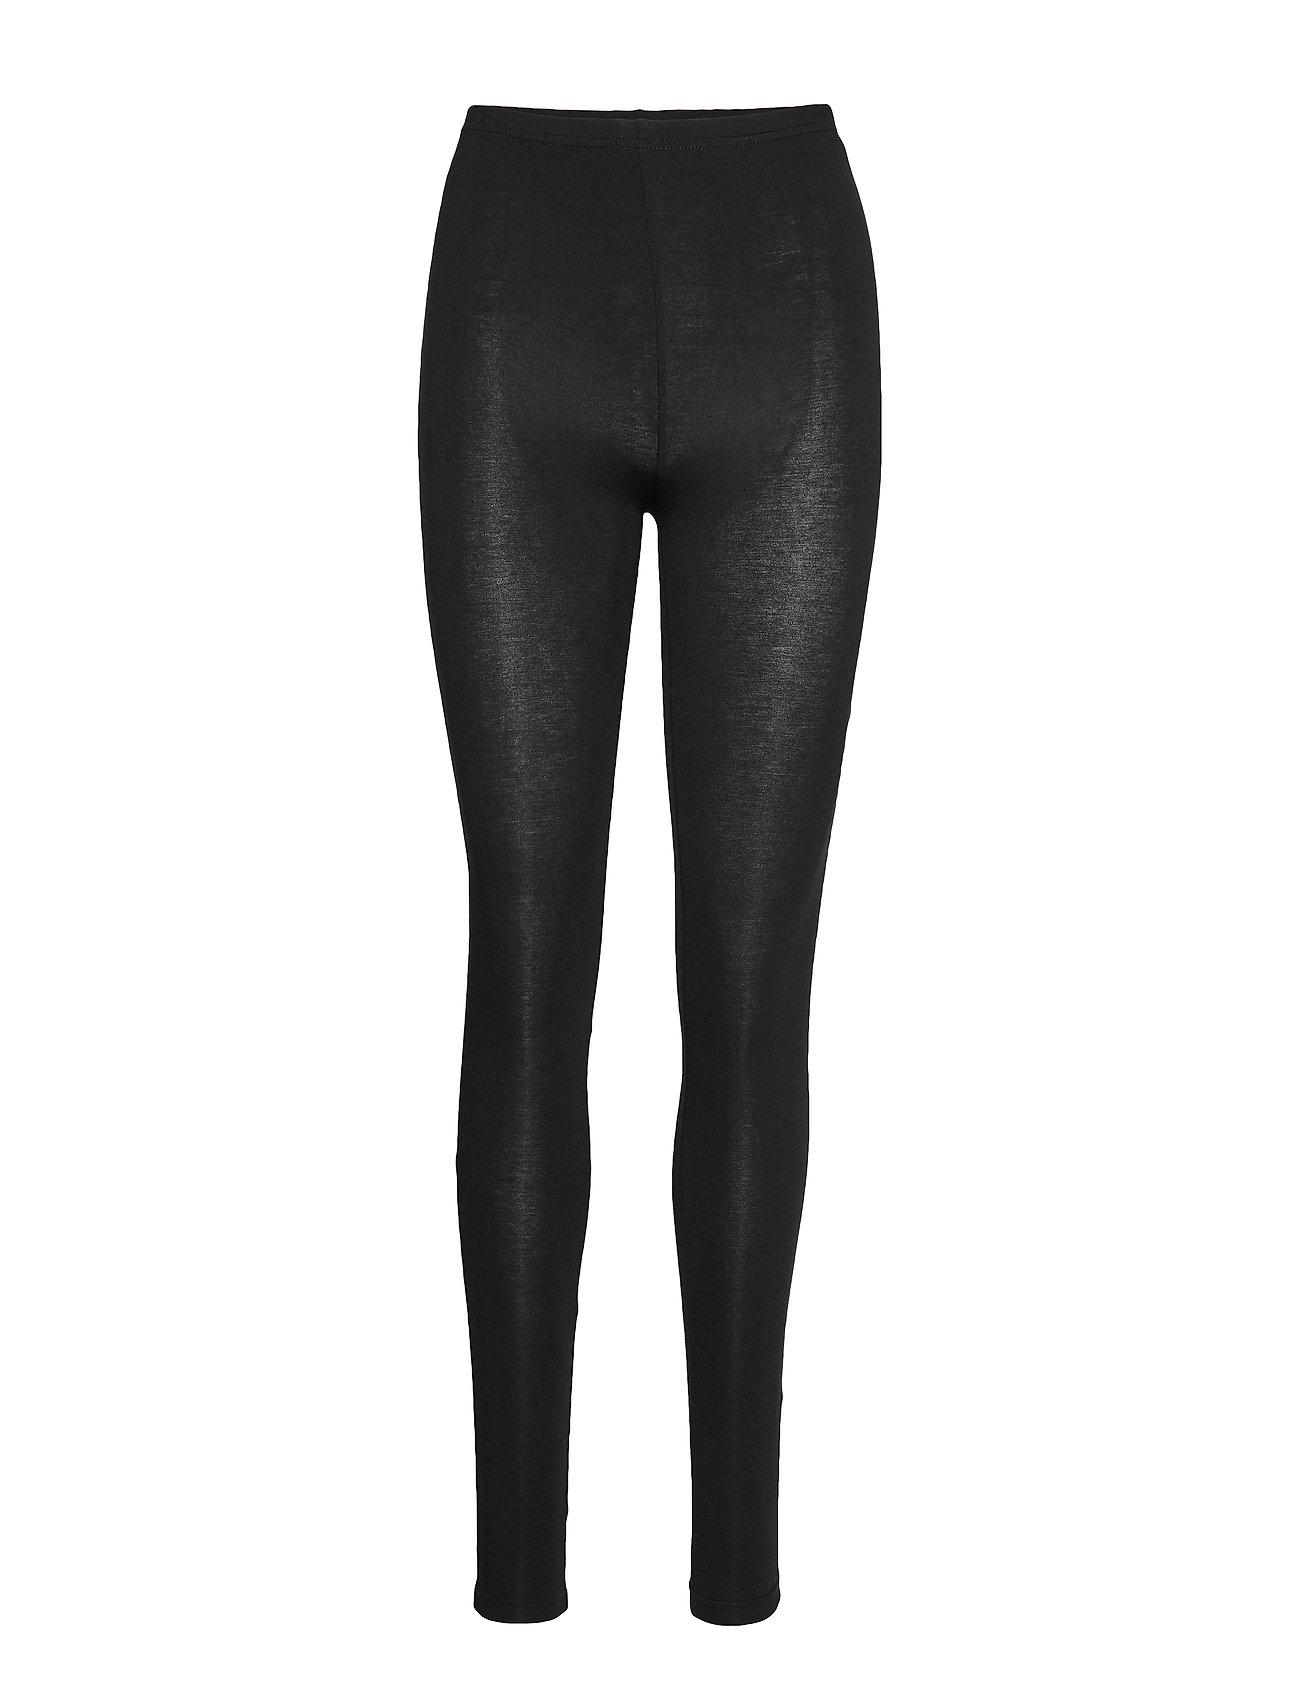 b.young Pamila leggings - Jersey - BLACK